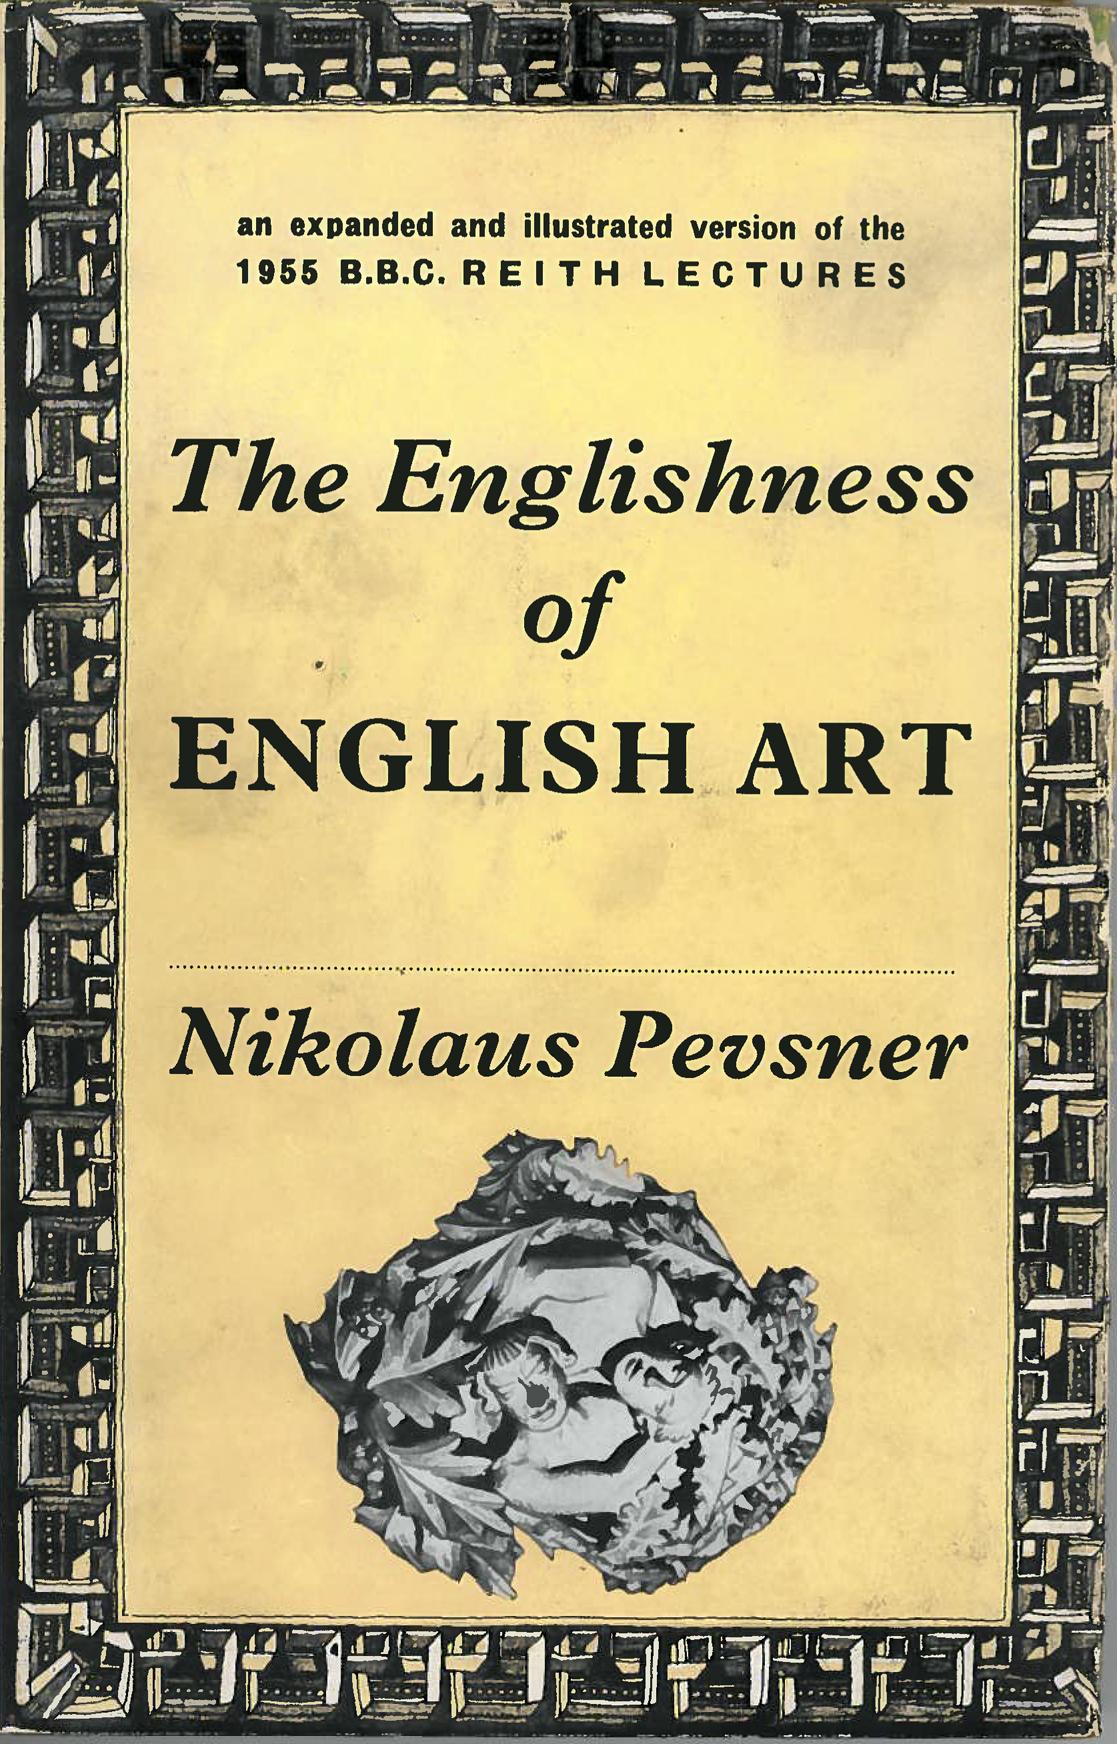 The Englishness of English Art